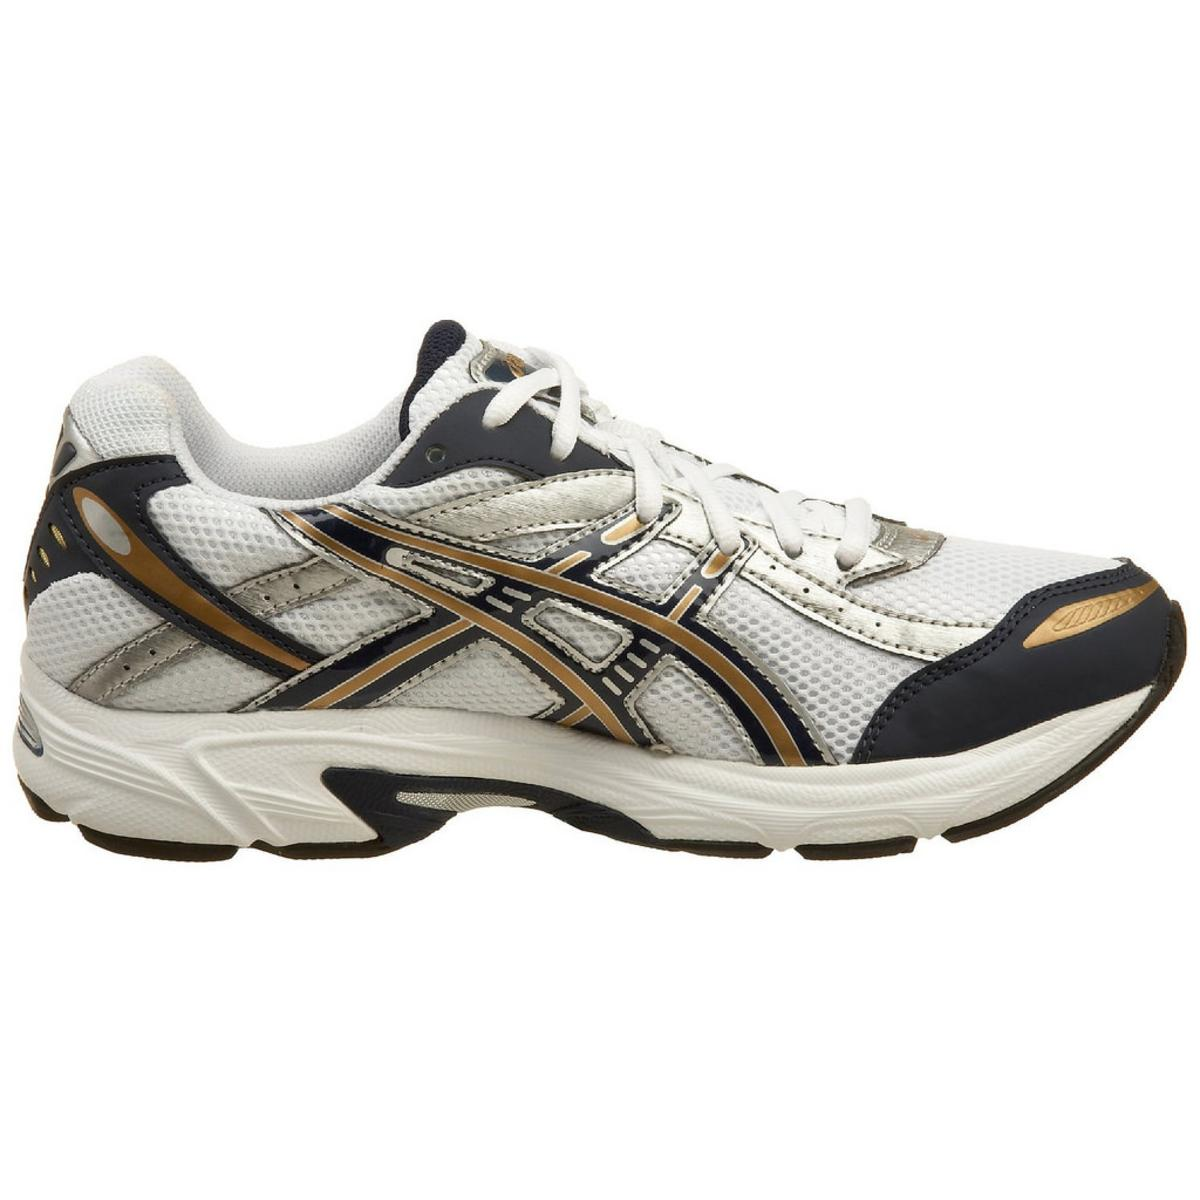 Asics Gel-Kanbarra 4 Men's White/Navy/Gold Running Sneakers 14M